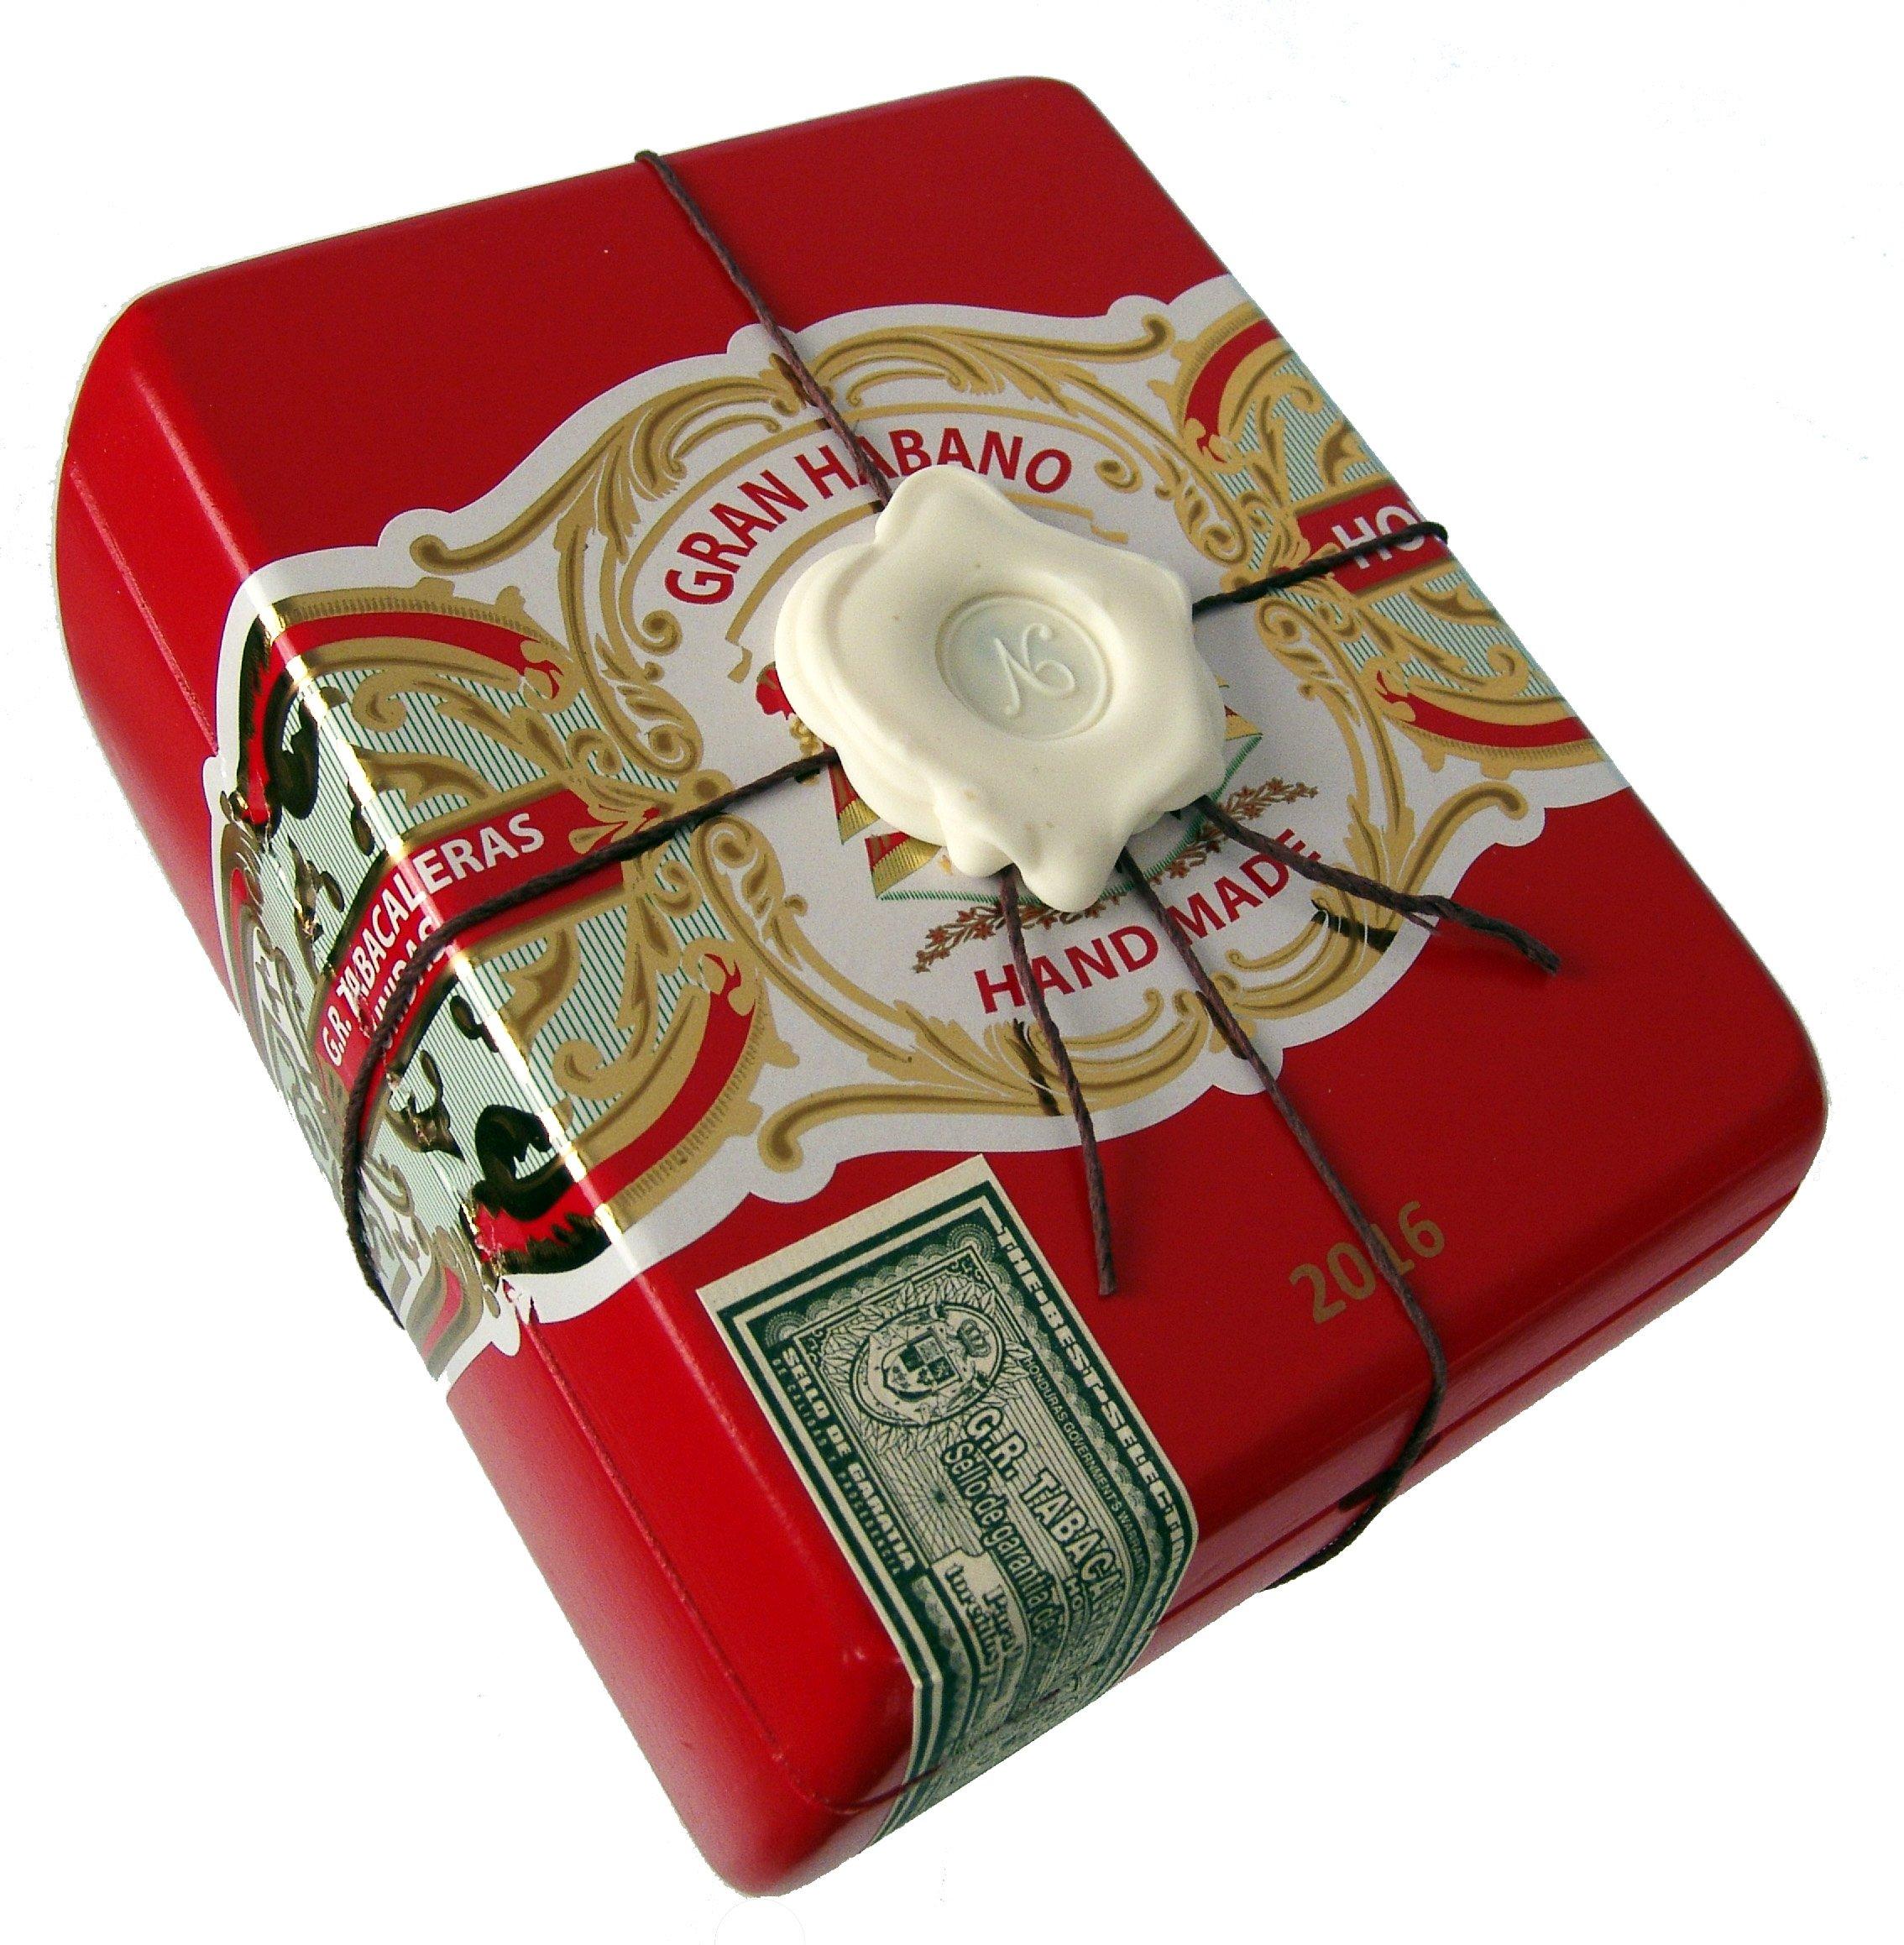 Nicholas Beard Works Men's Holiday Gift Set 2x2oz Premium Beard Oil Gift Box